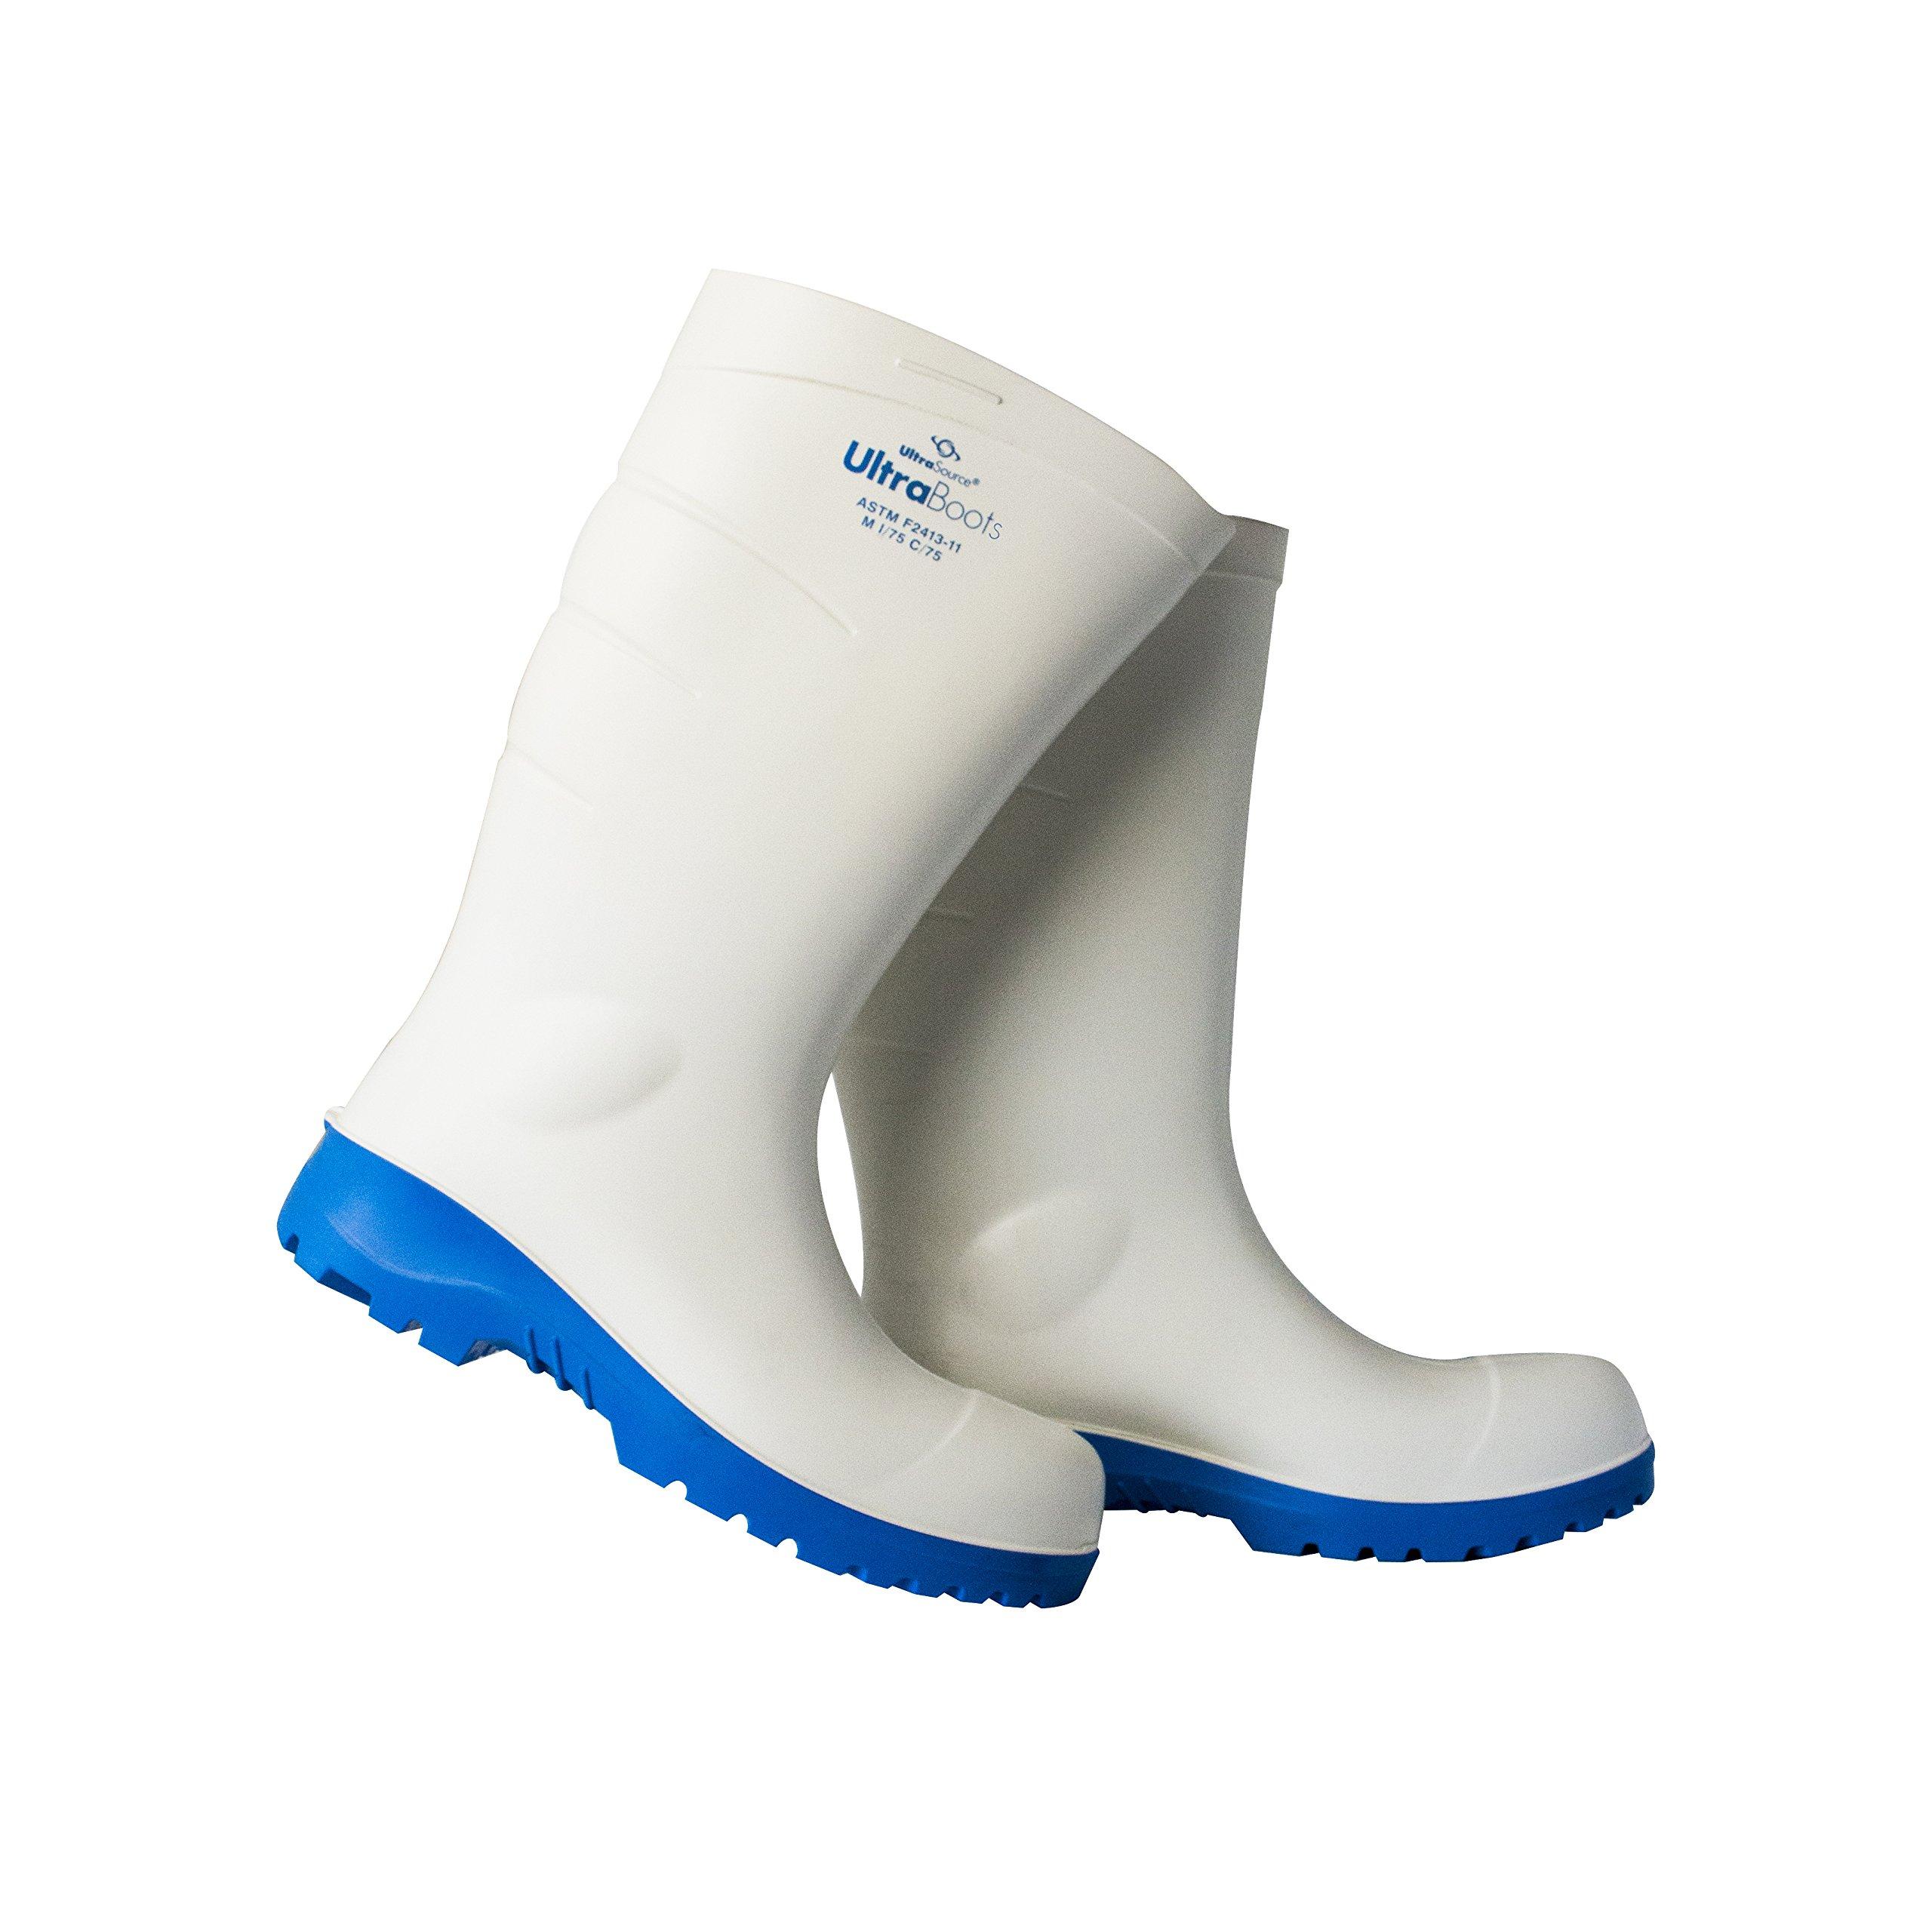 UltraSource Polyurethane Steel Toe Work Boots, White, Size 12